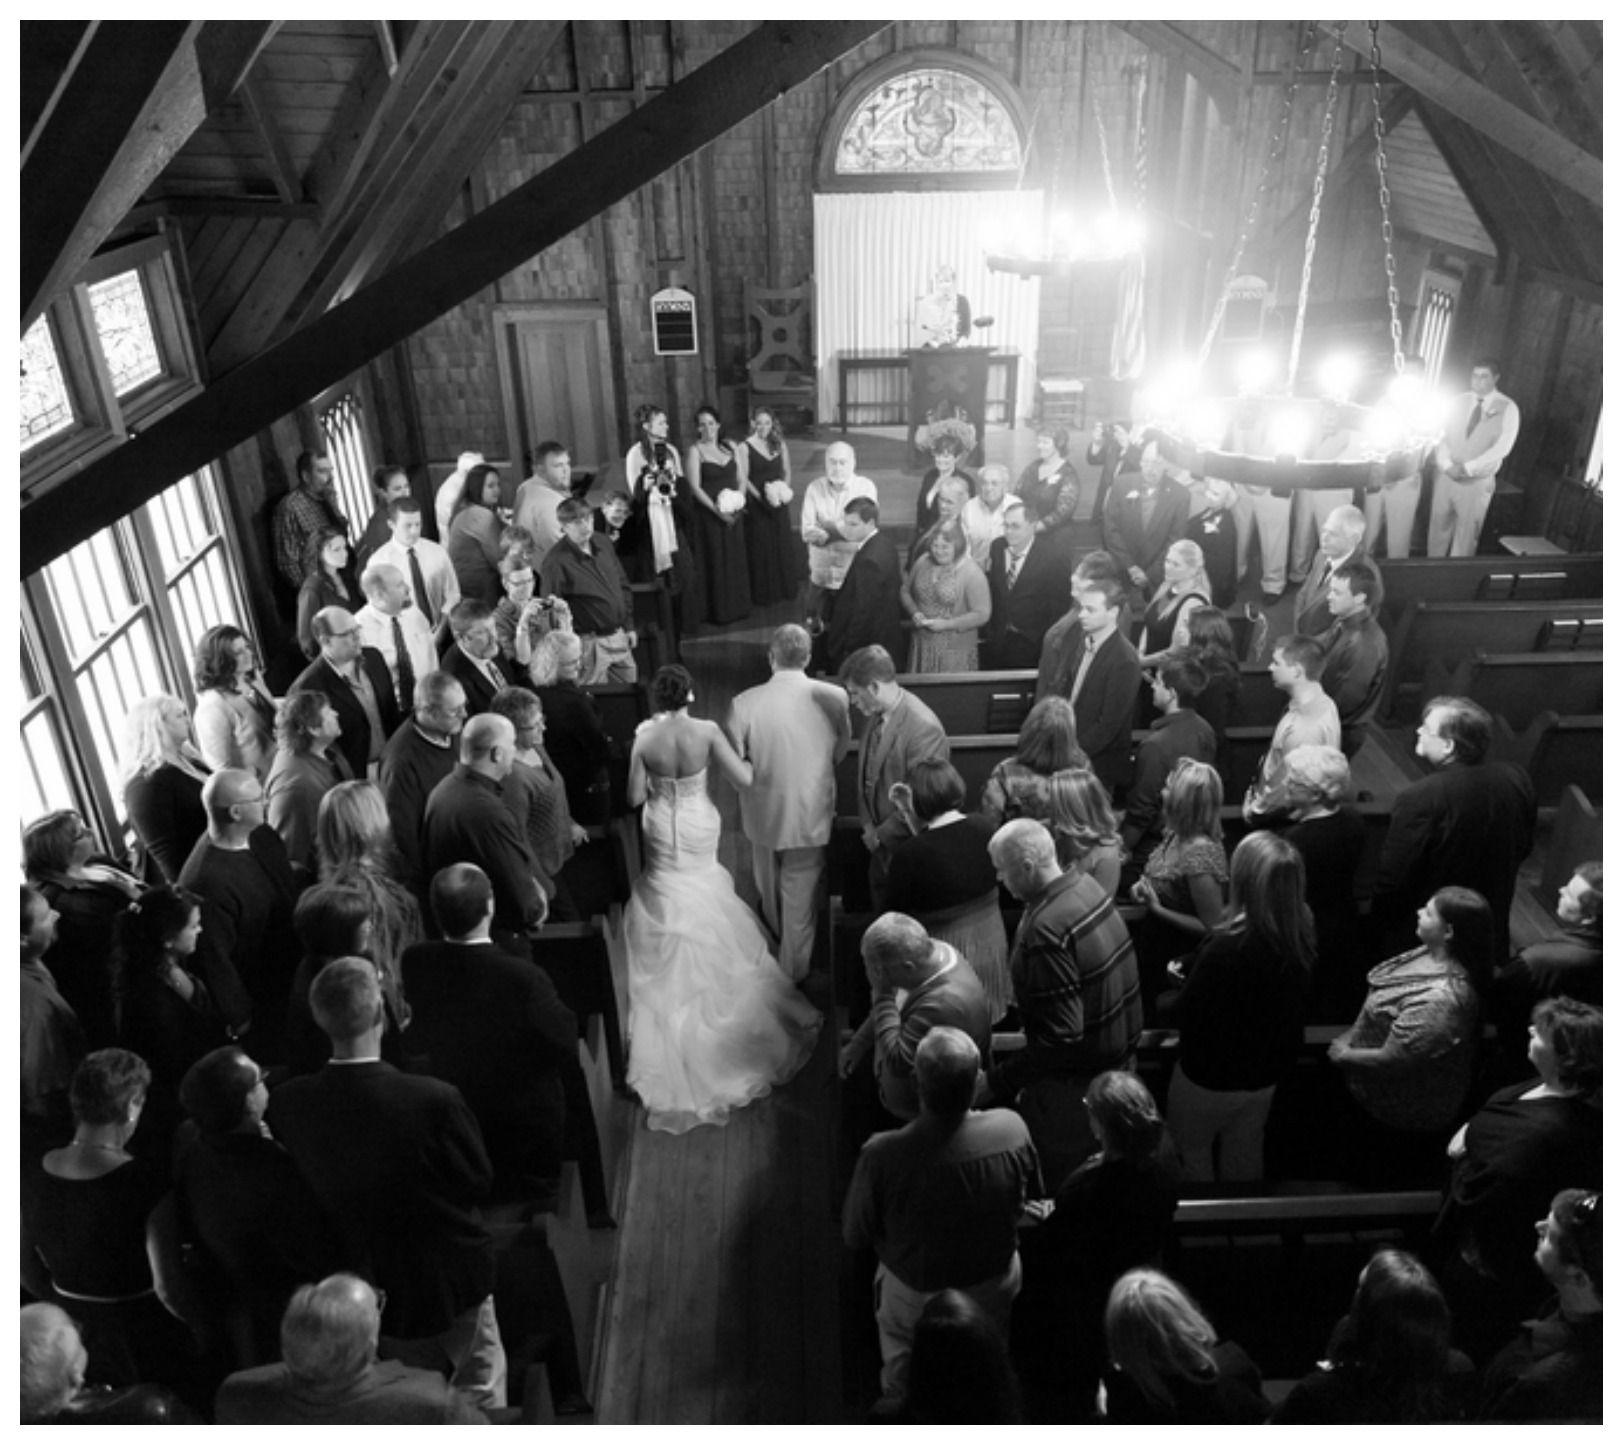 Rustic Maine Coastline Wedding Rustic Wedding Chic